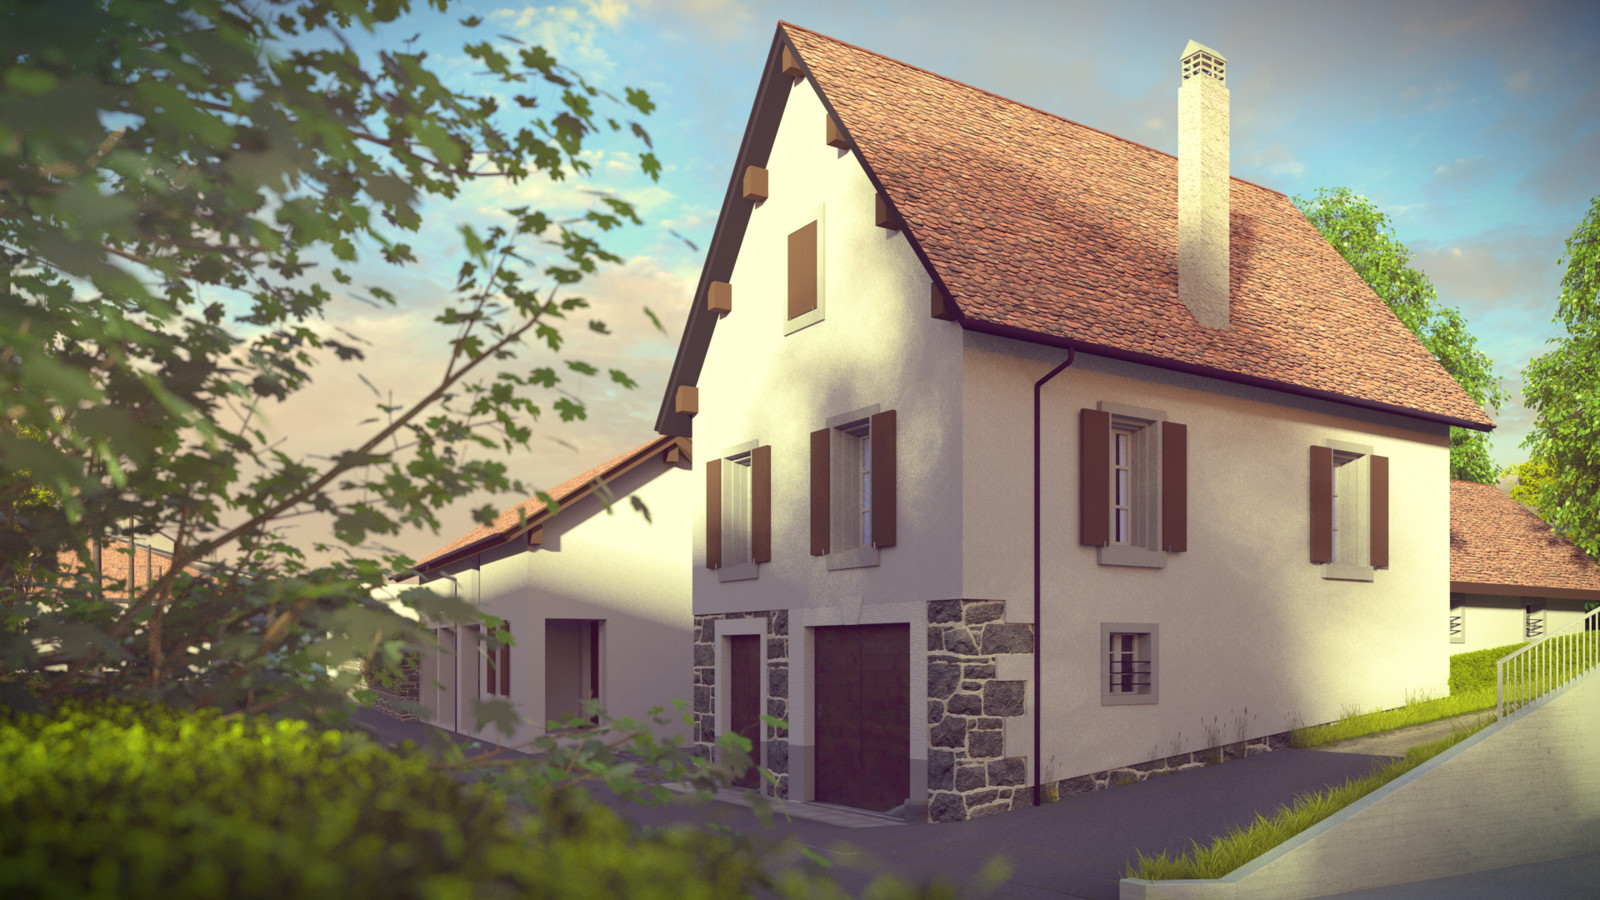 SketchUp + Thea Render  Little Swiss House 01b WIP test 02 Presto MC Vullierens complete 02 SUv2016-Scene 28b Lumina HD 1920 x 1080 Presto MC